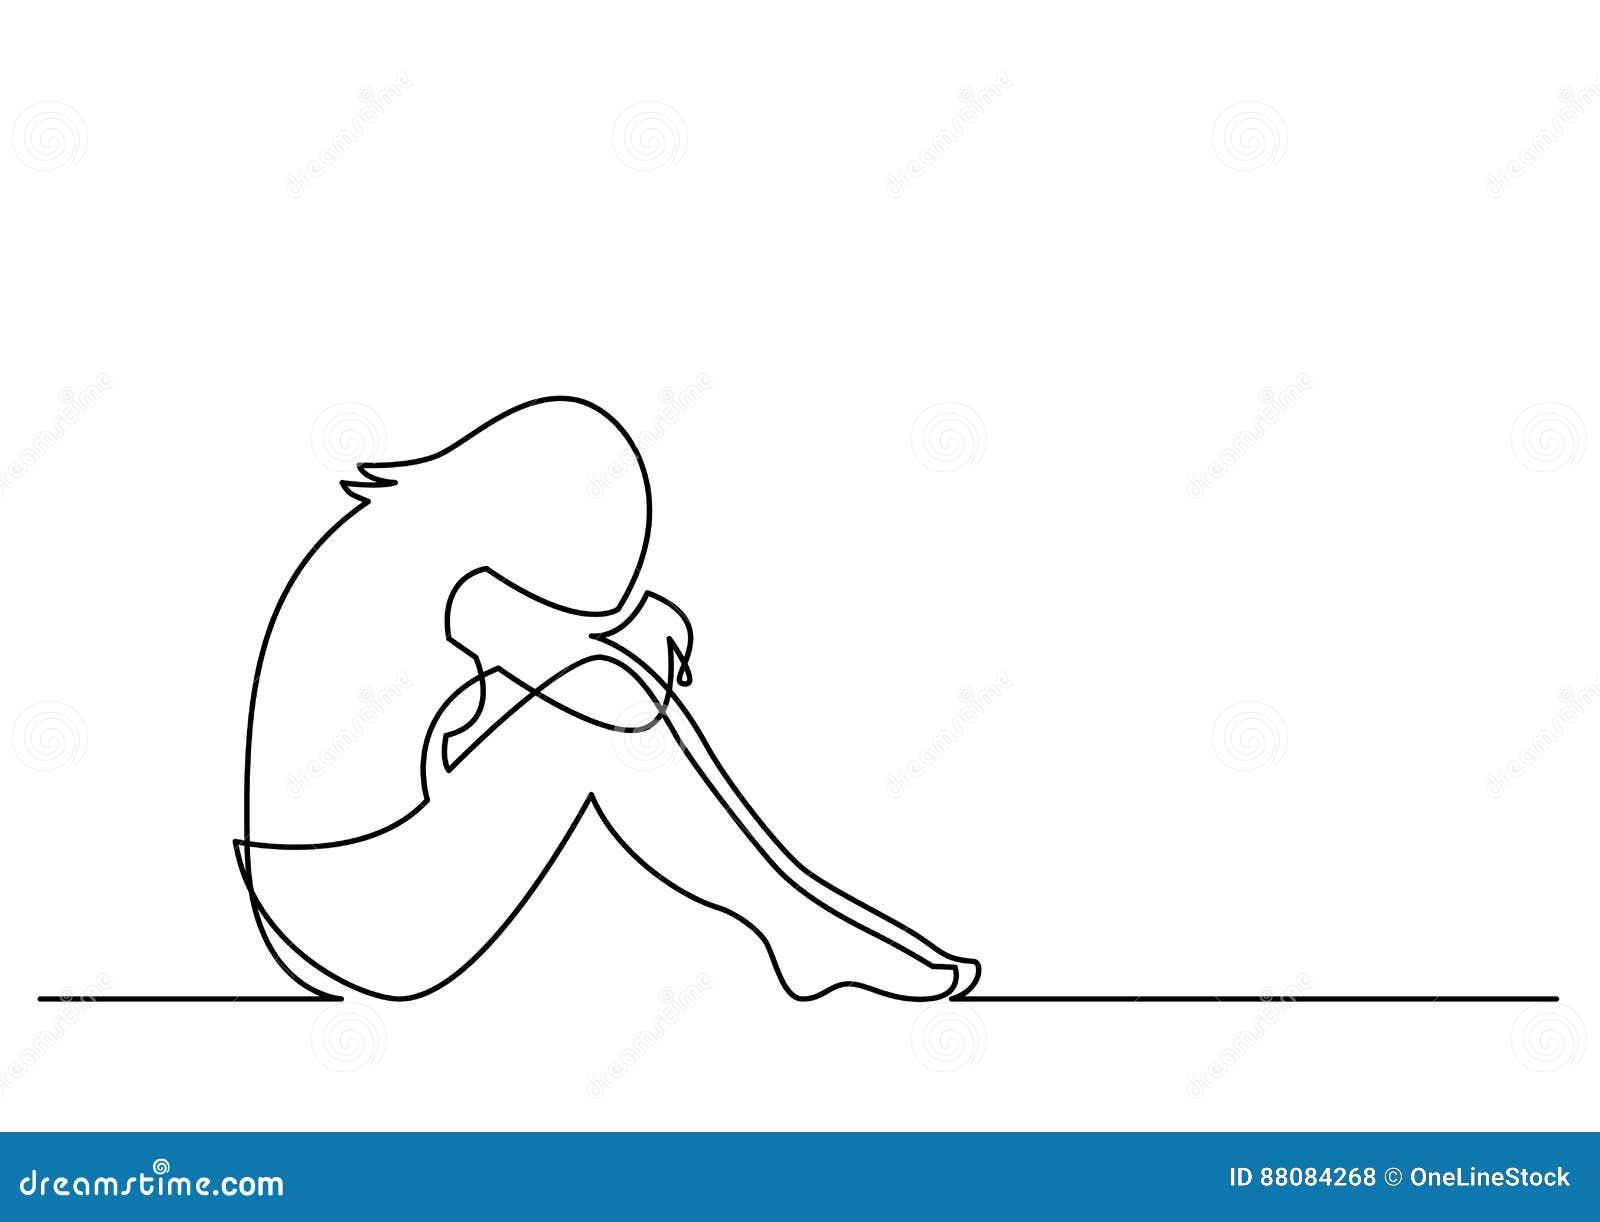 Dessin Au Trait Continu De La Seance Deprimee De Femme Illustration